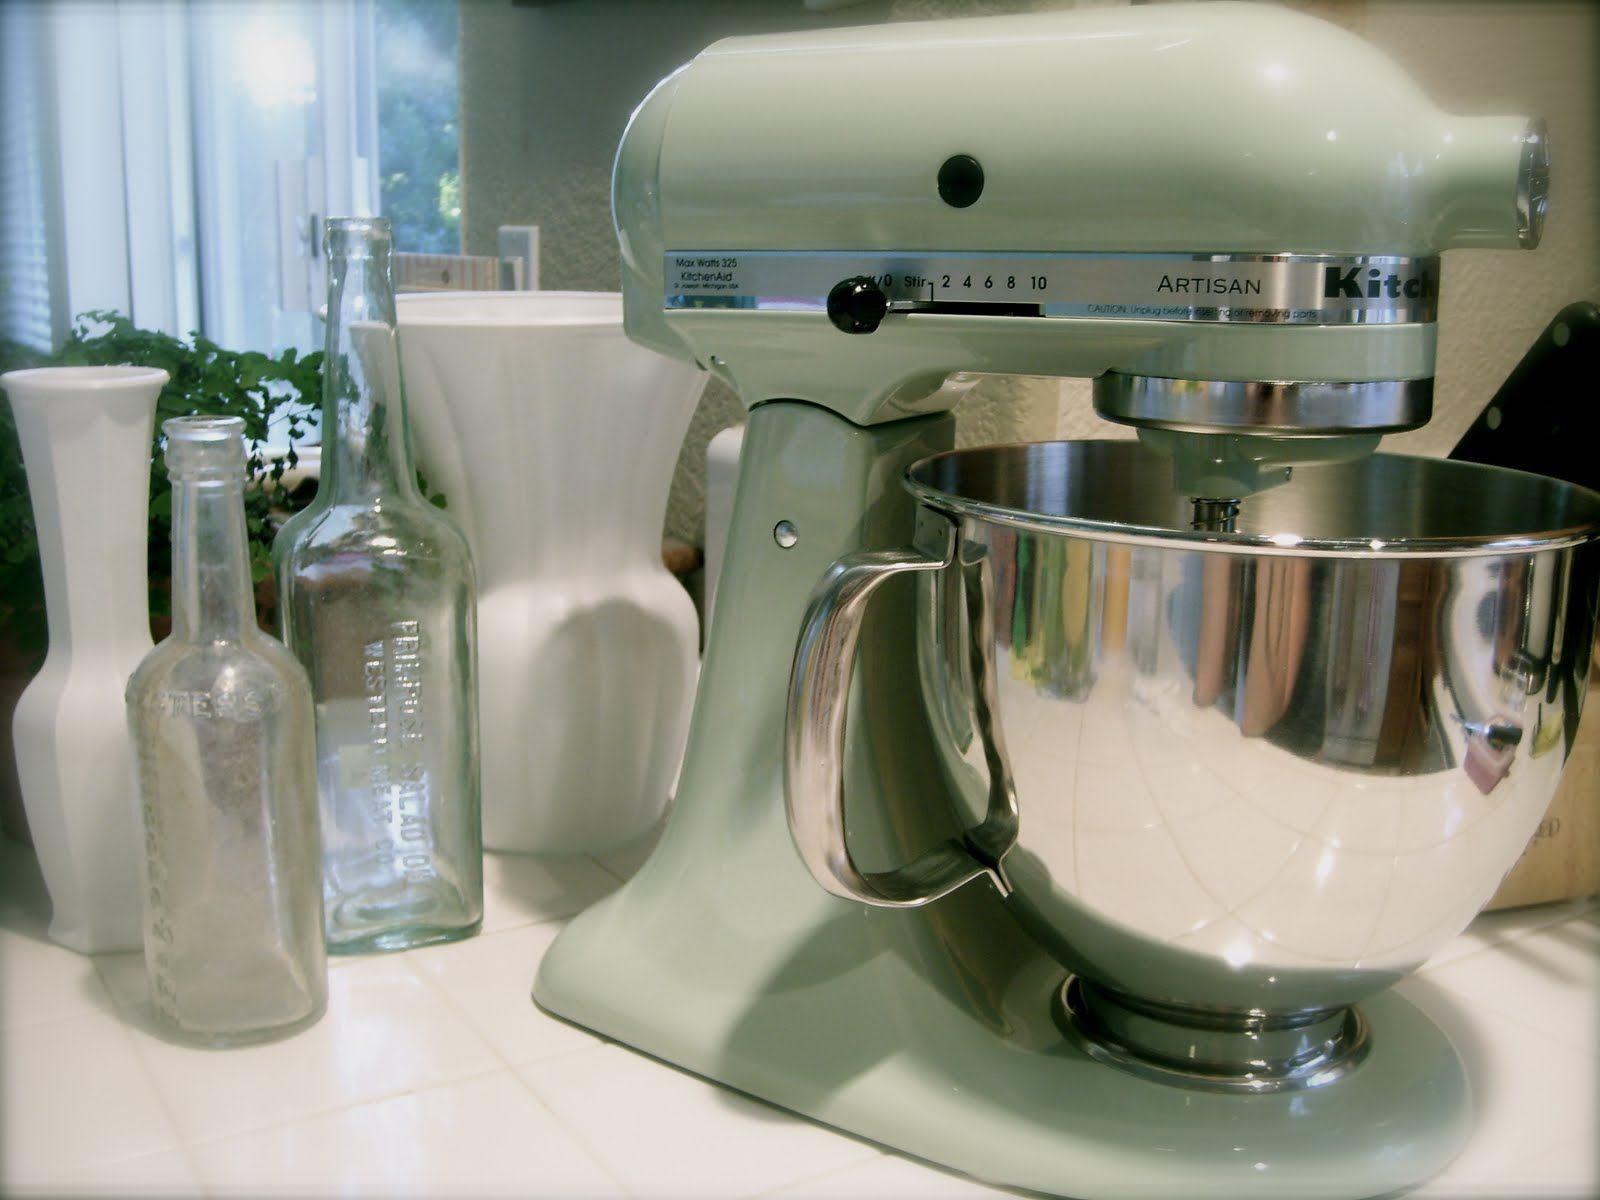 My Dream A Pistachio Kitchenaid Kitchen Aid Mixer Kitchen Aid